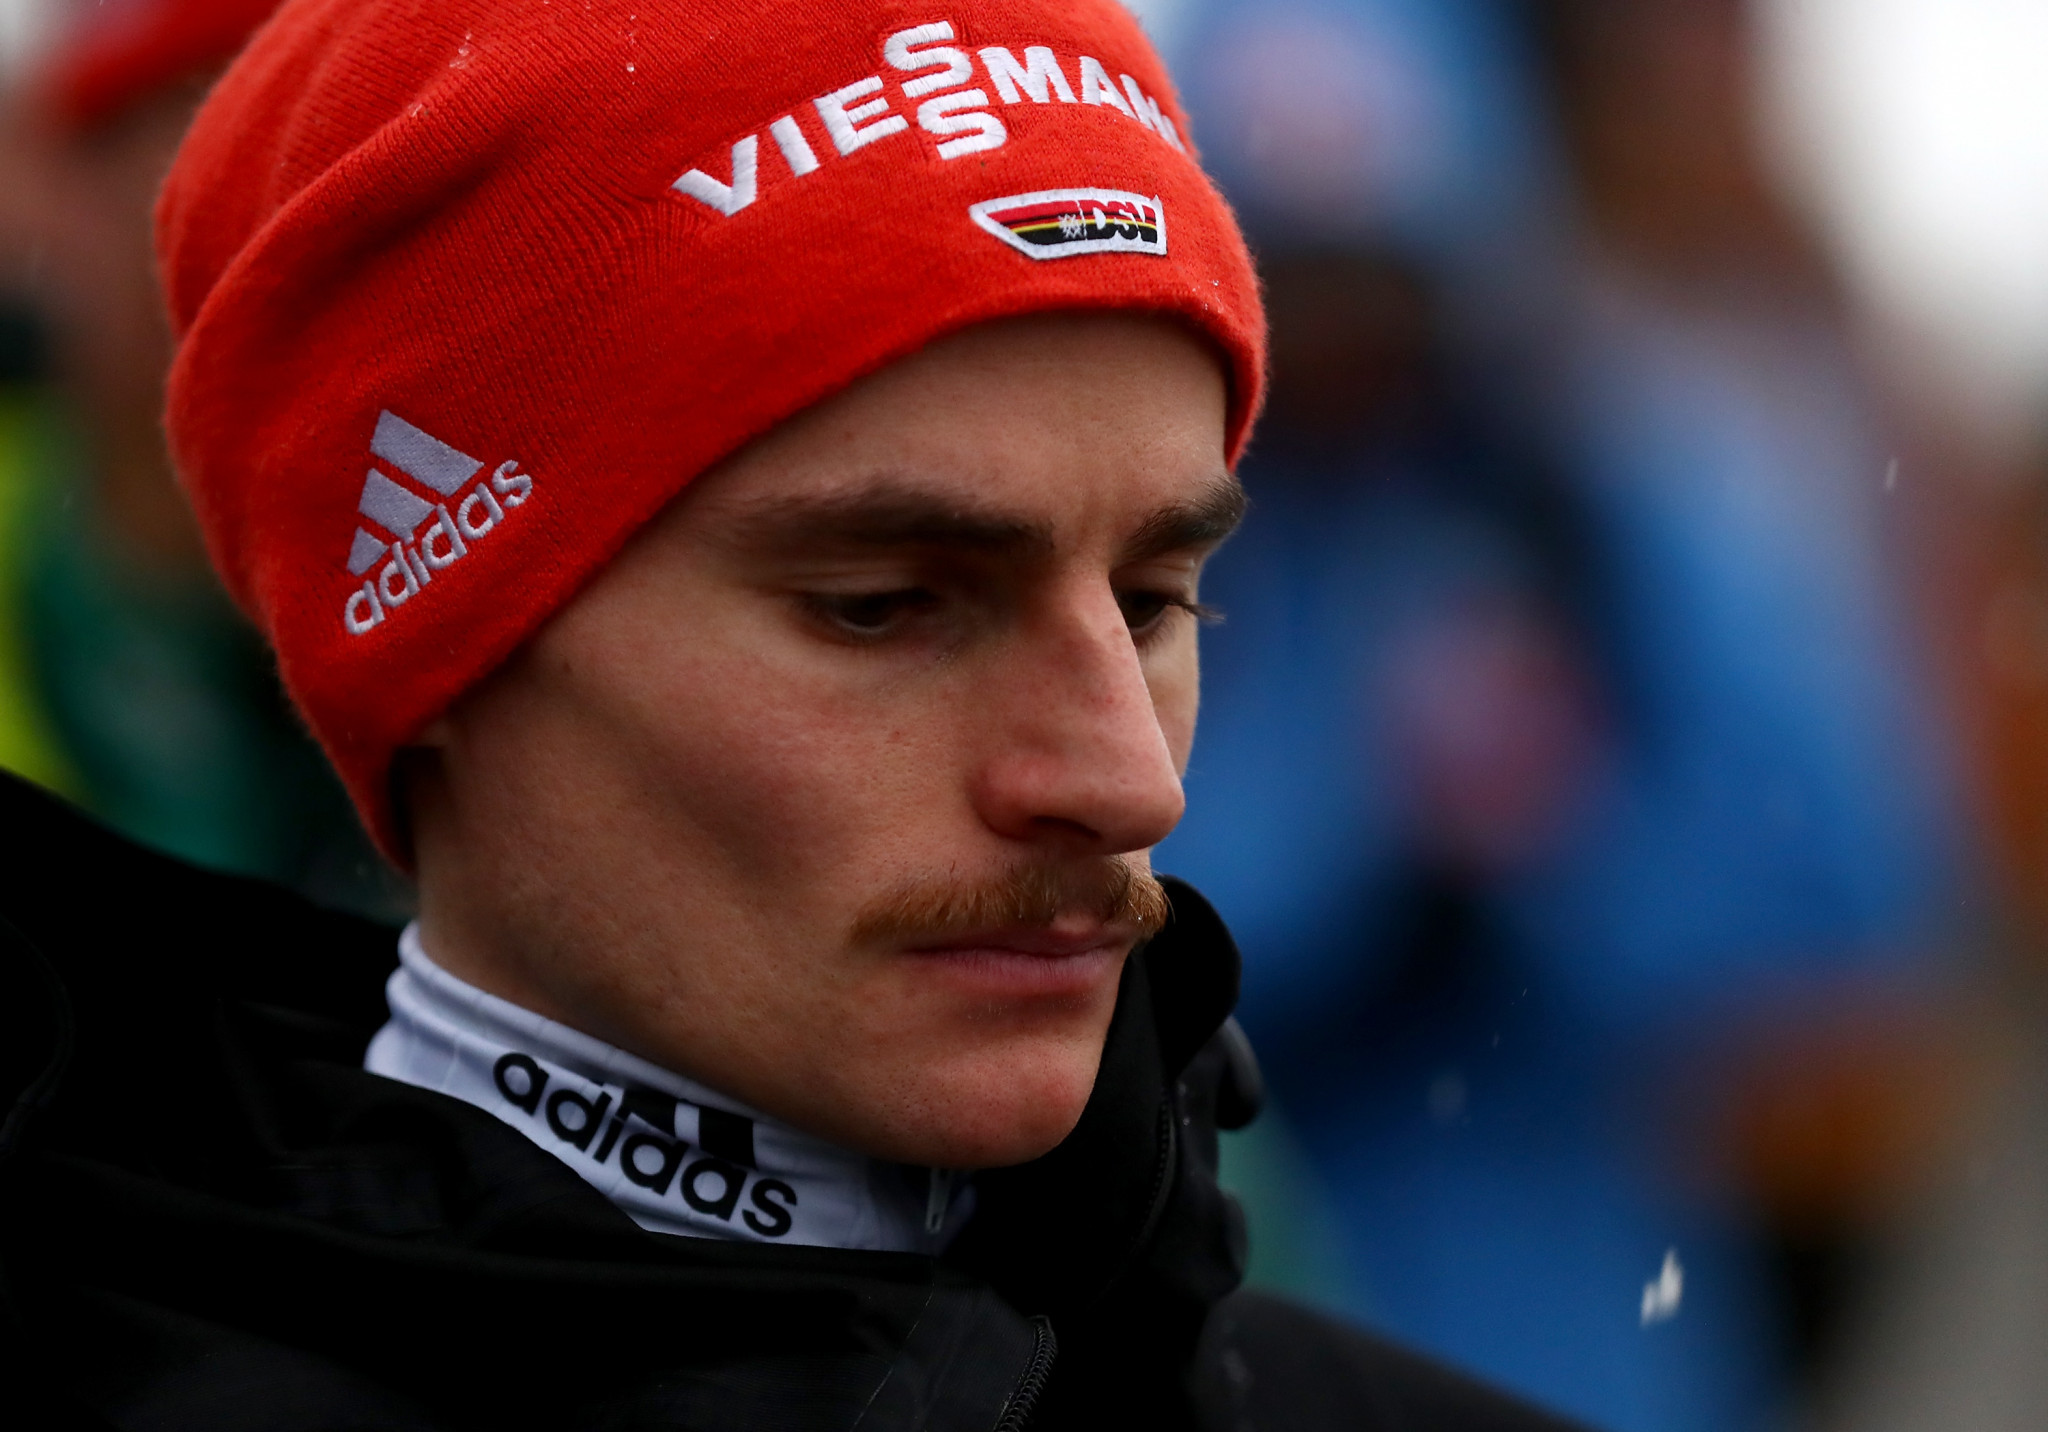 Freitag returns in time for home Ski Flying World Championships